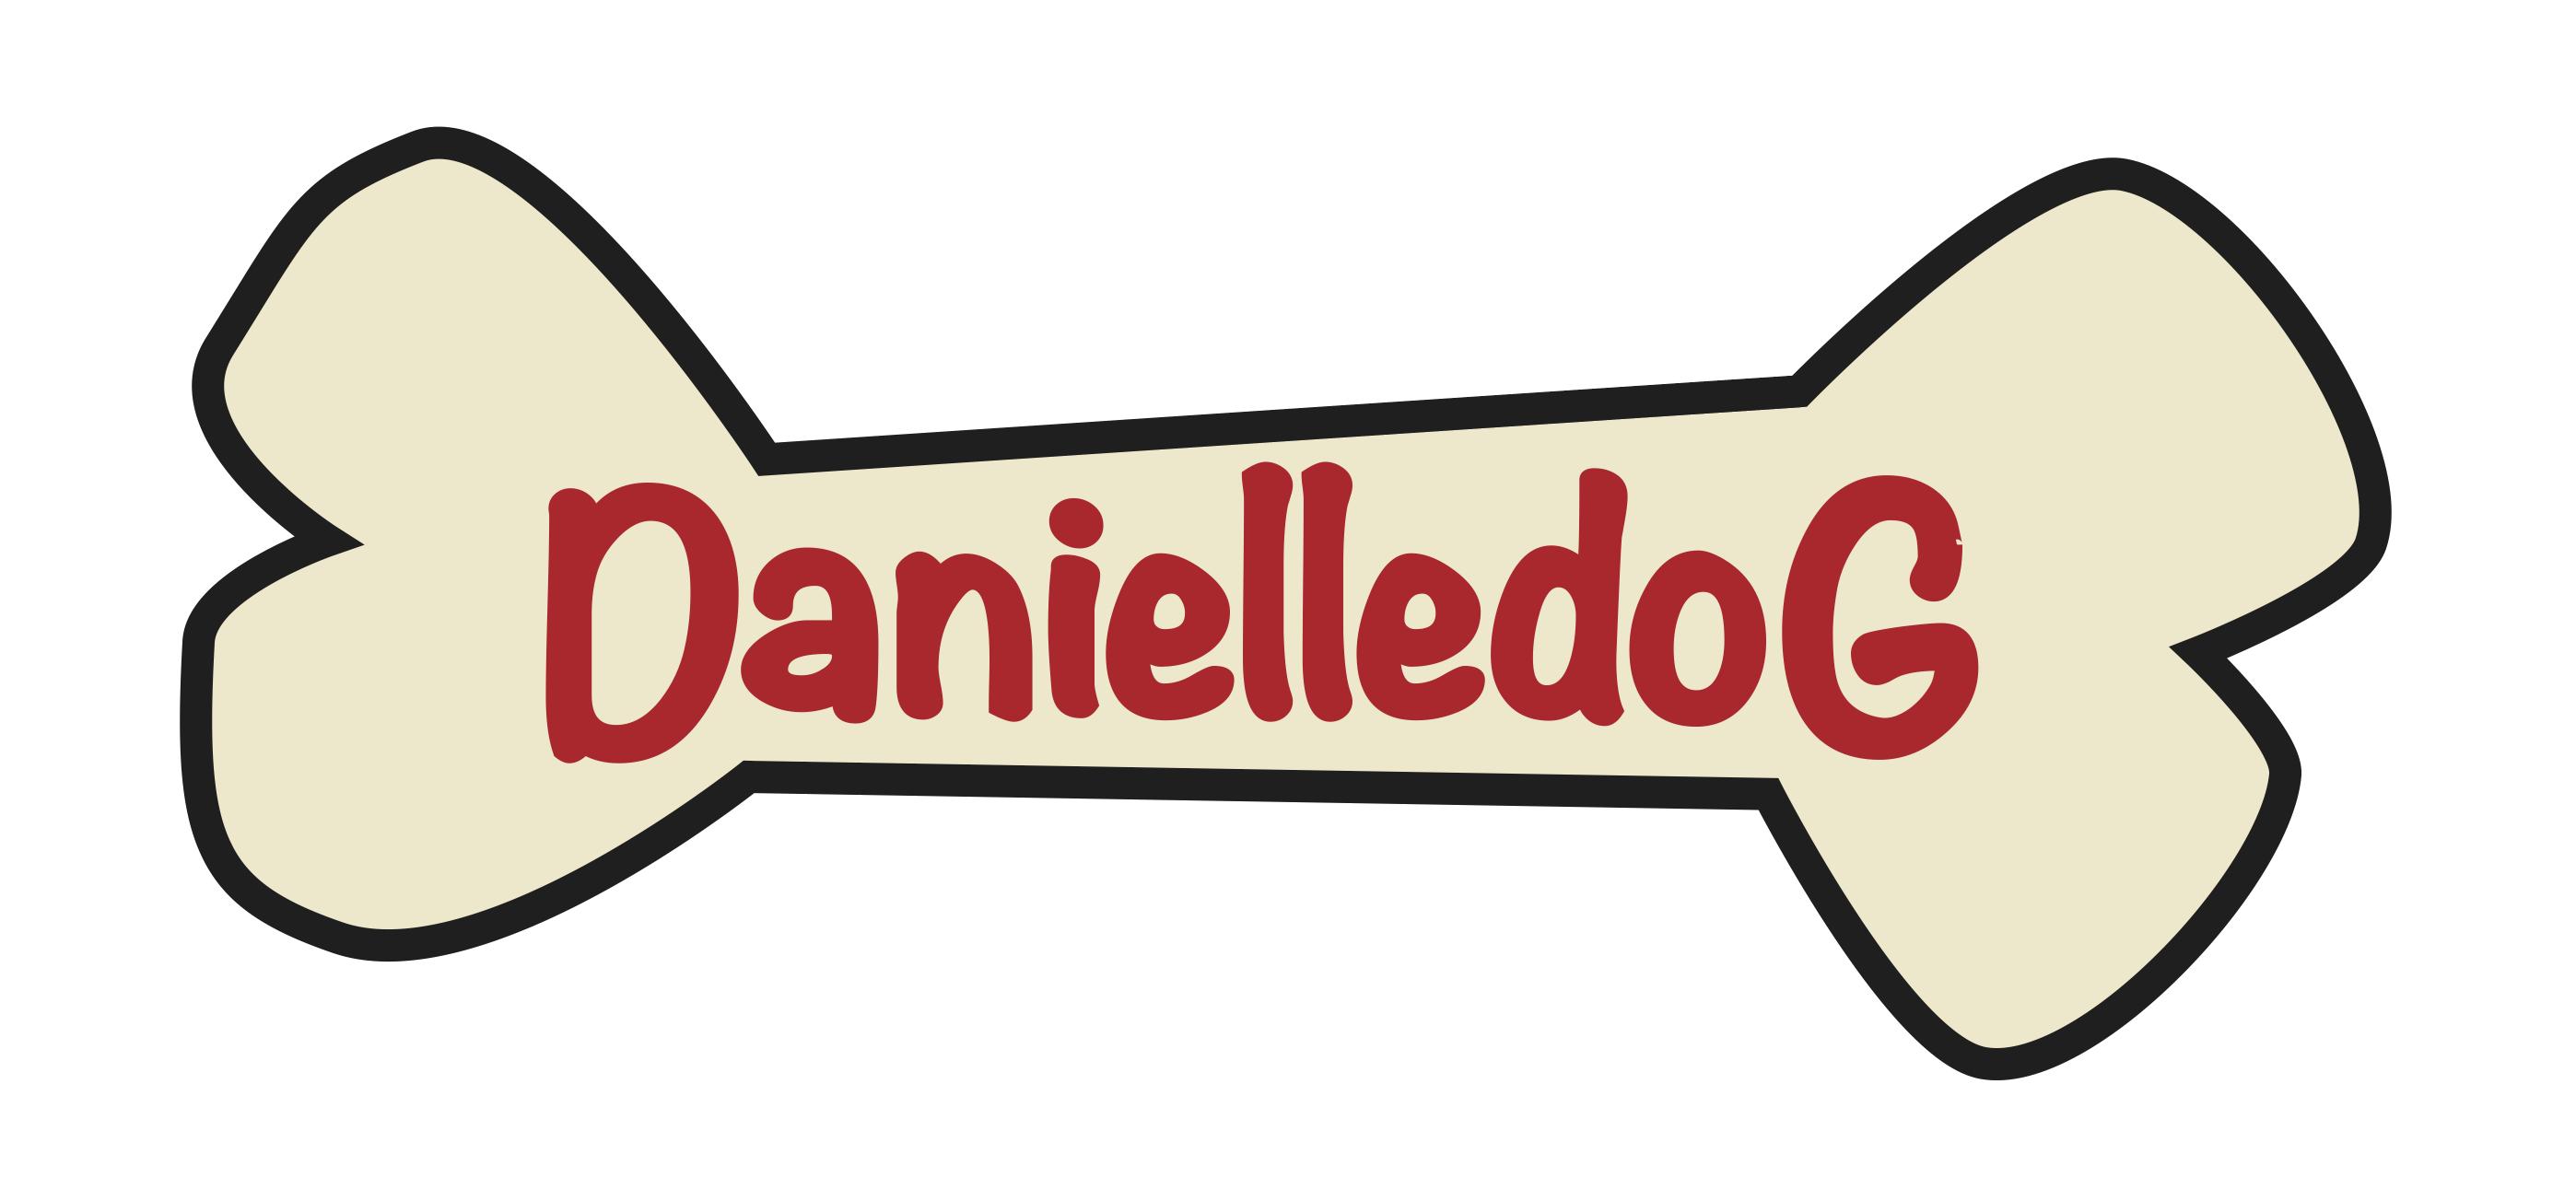 DanielleDog